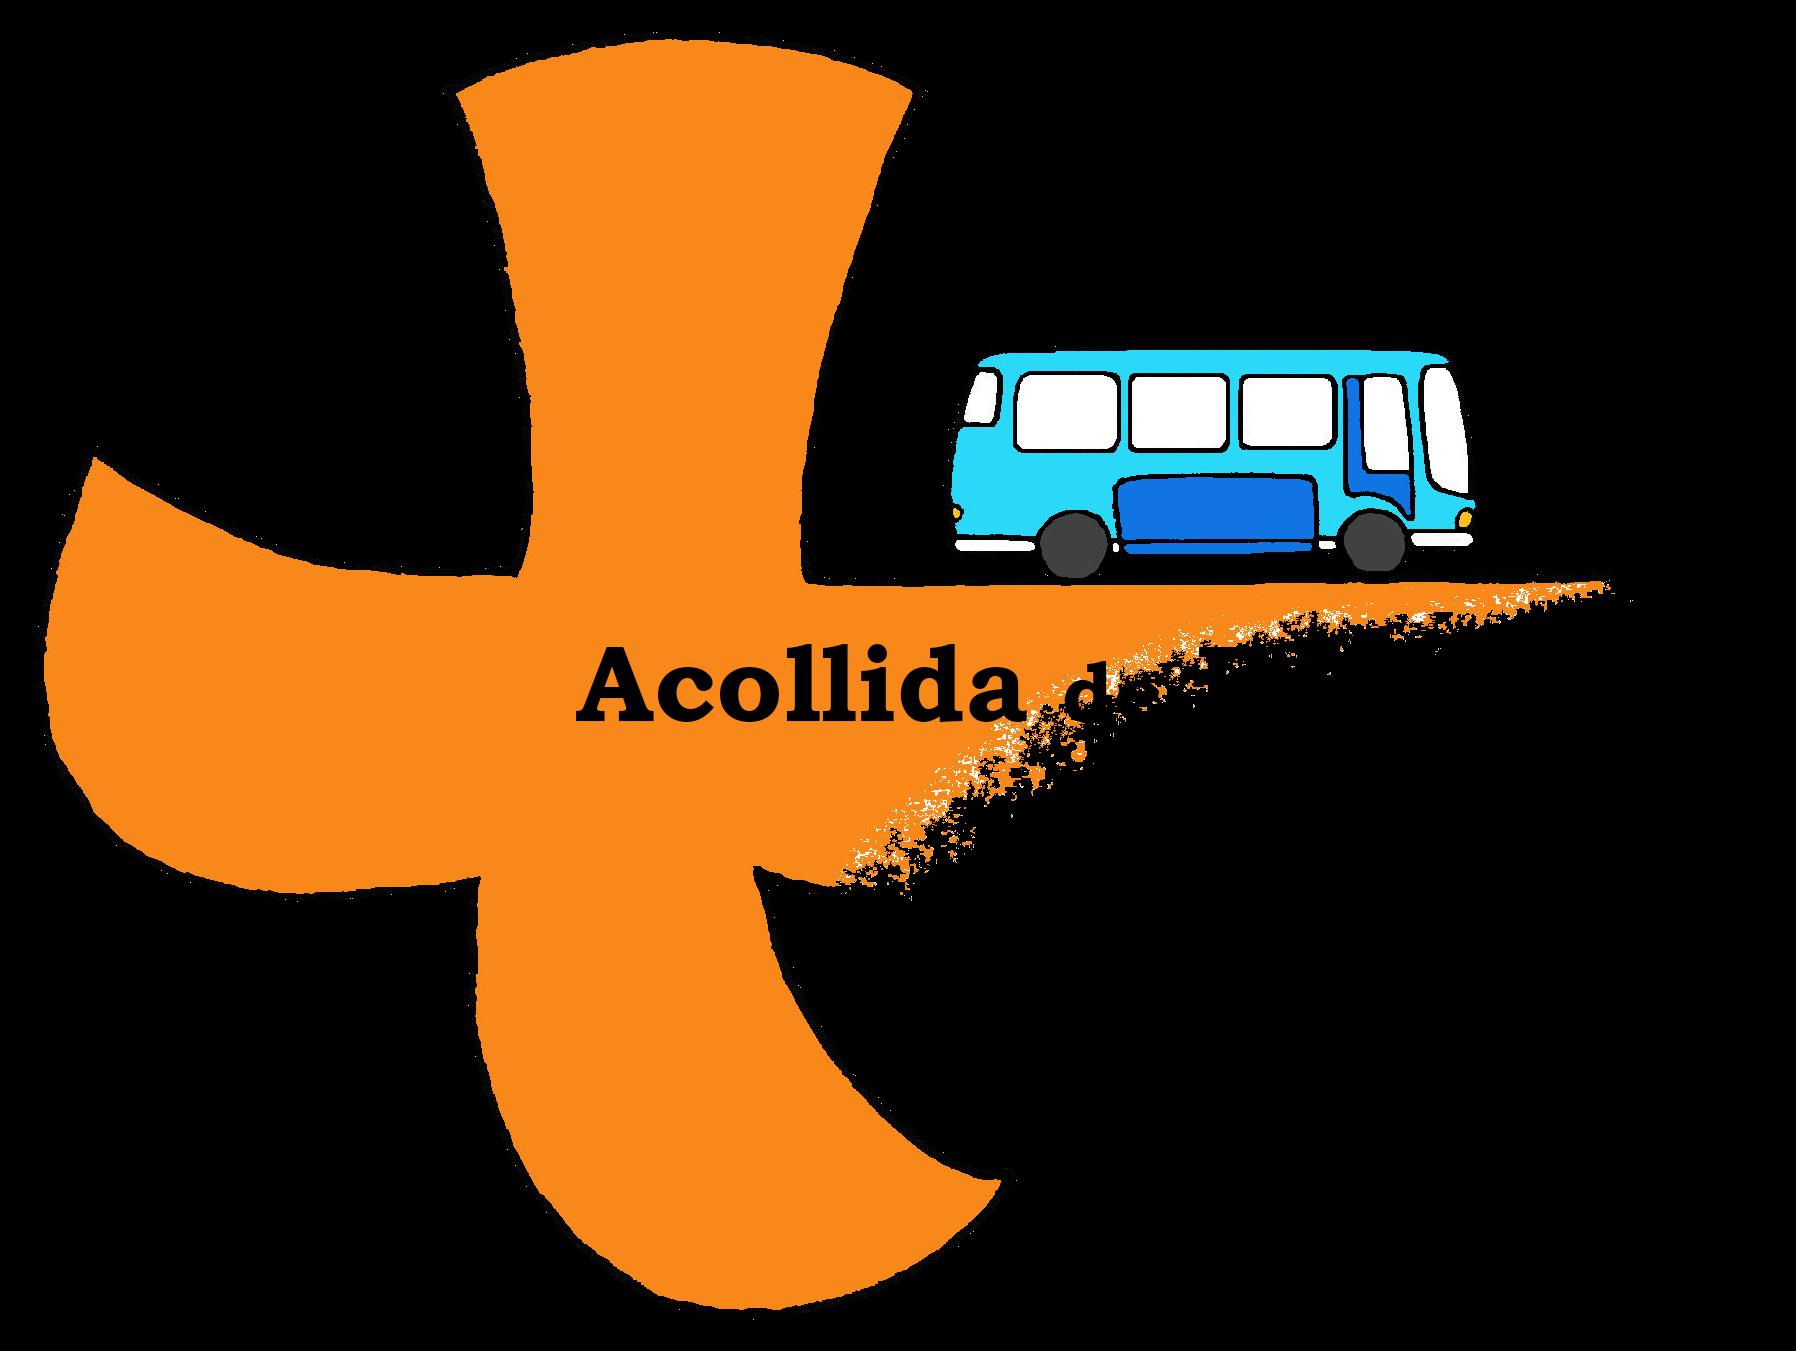 cropped-logo-acollida-sense-fons-lletres.png